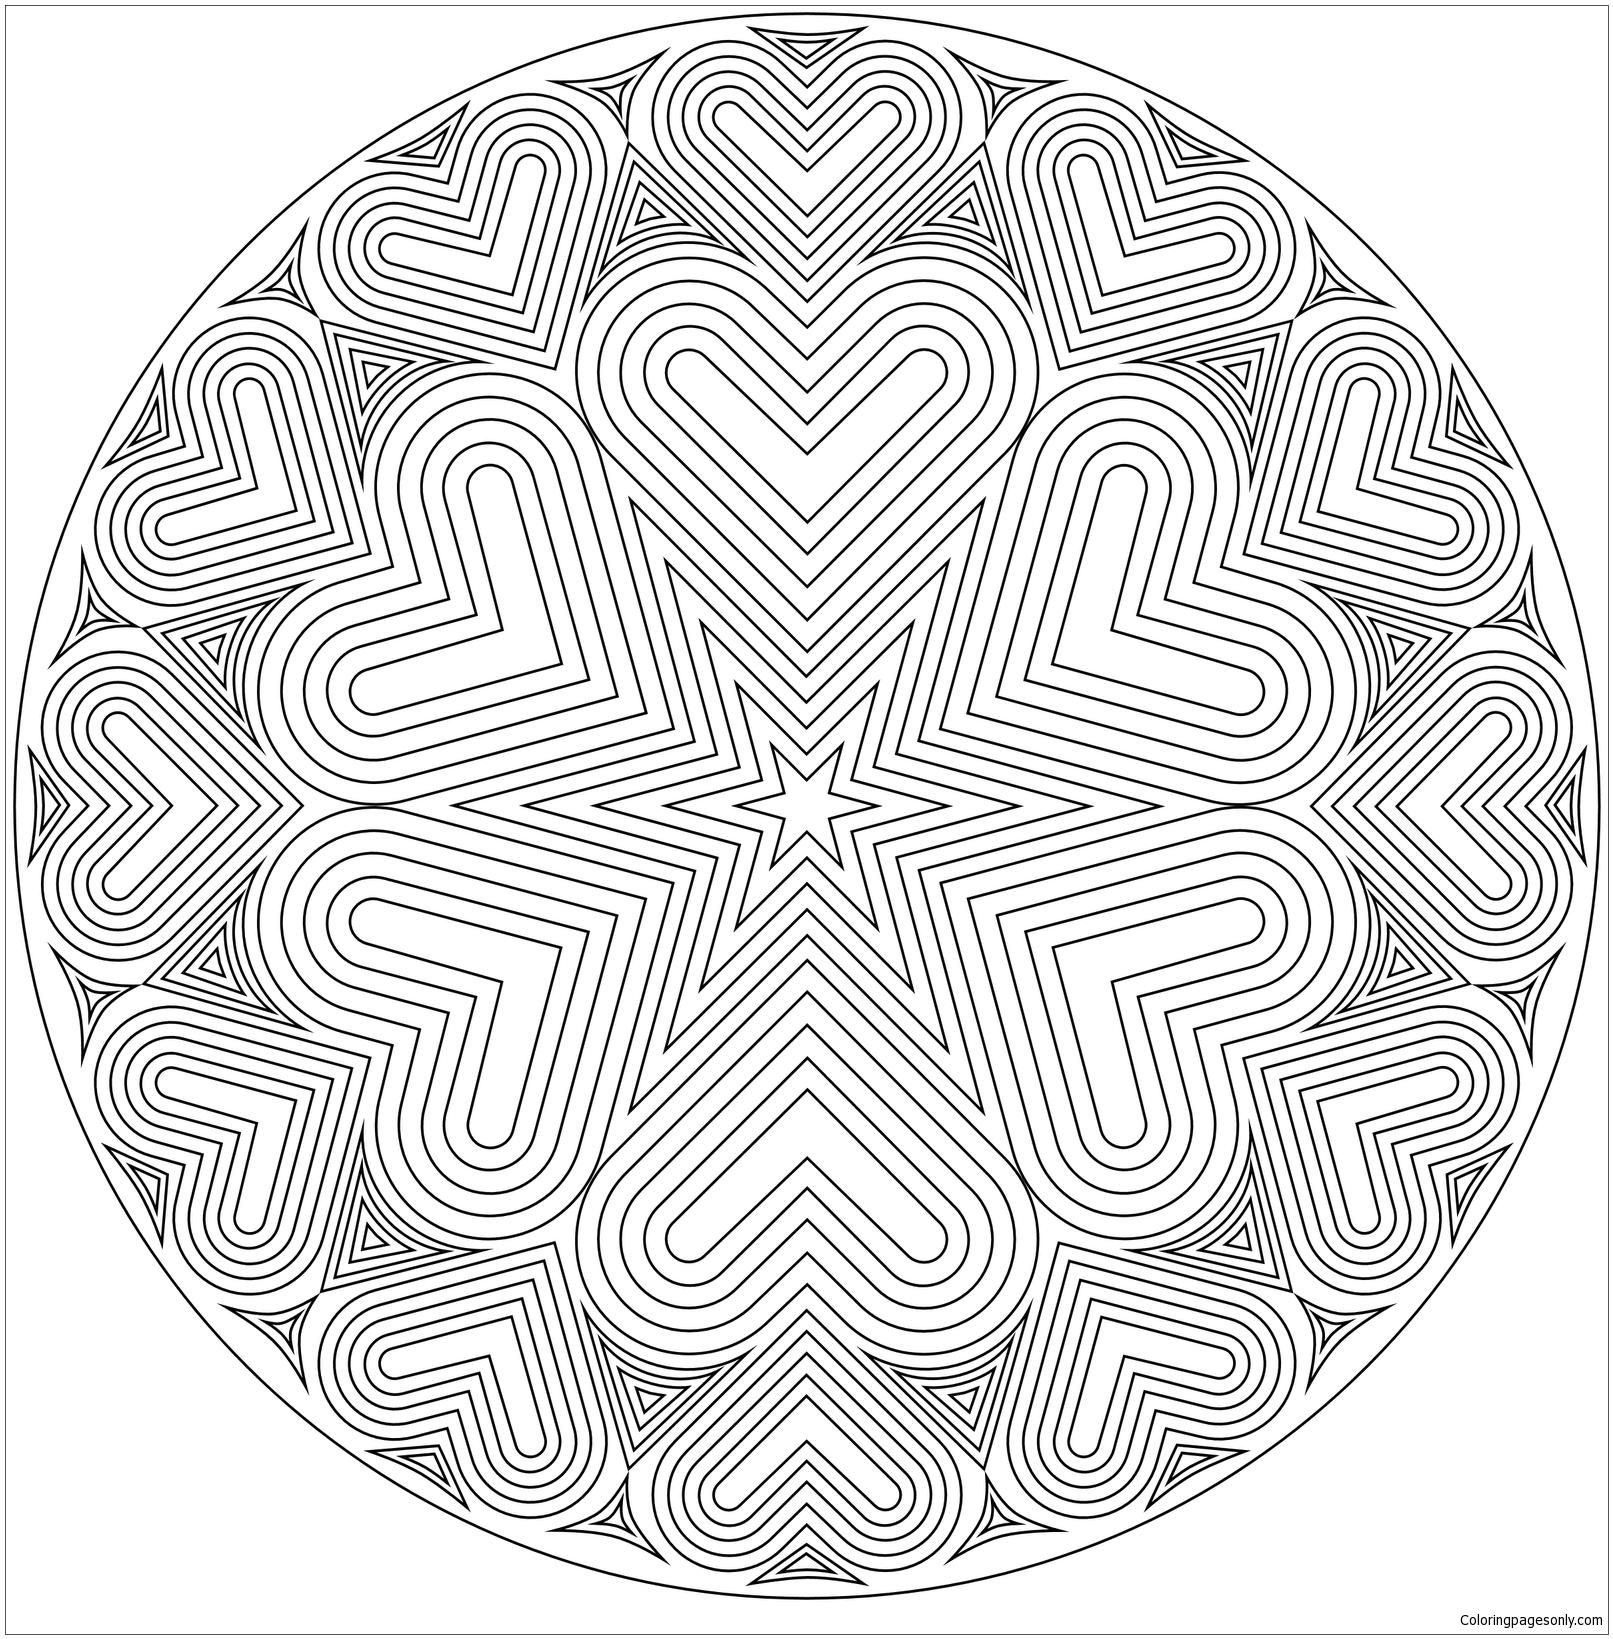 Bullseye Heart Mandala Coloring Page